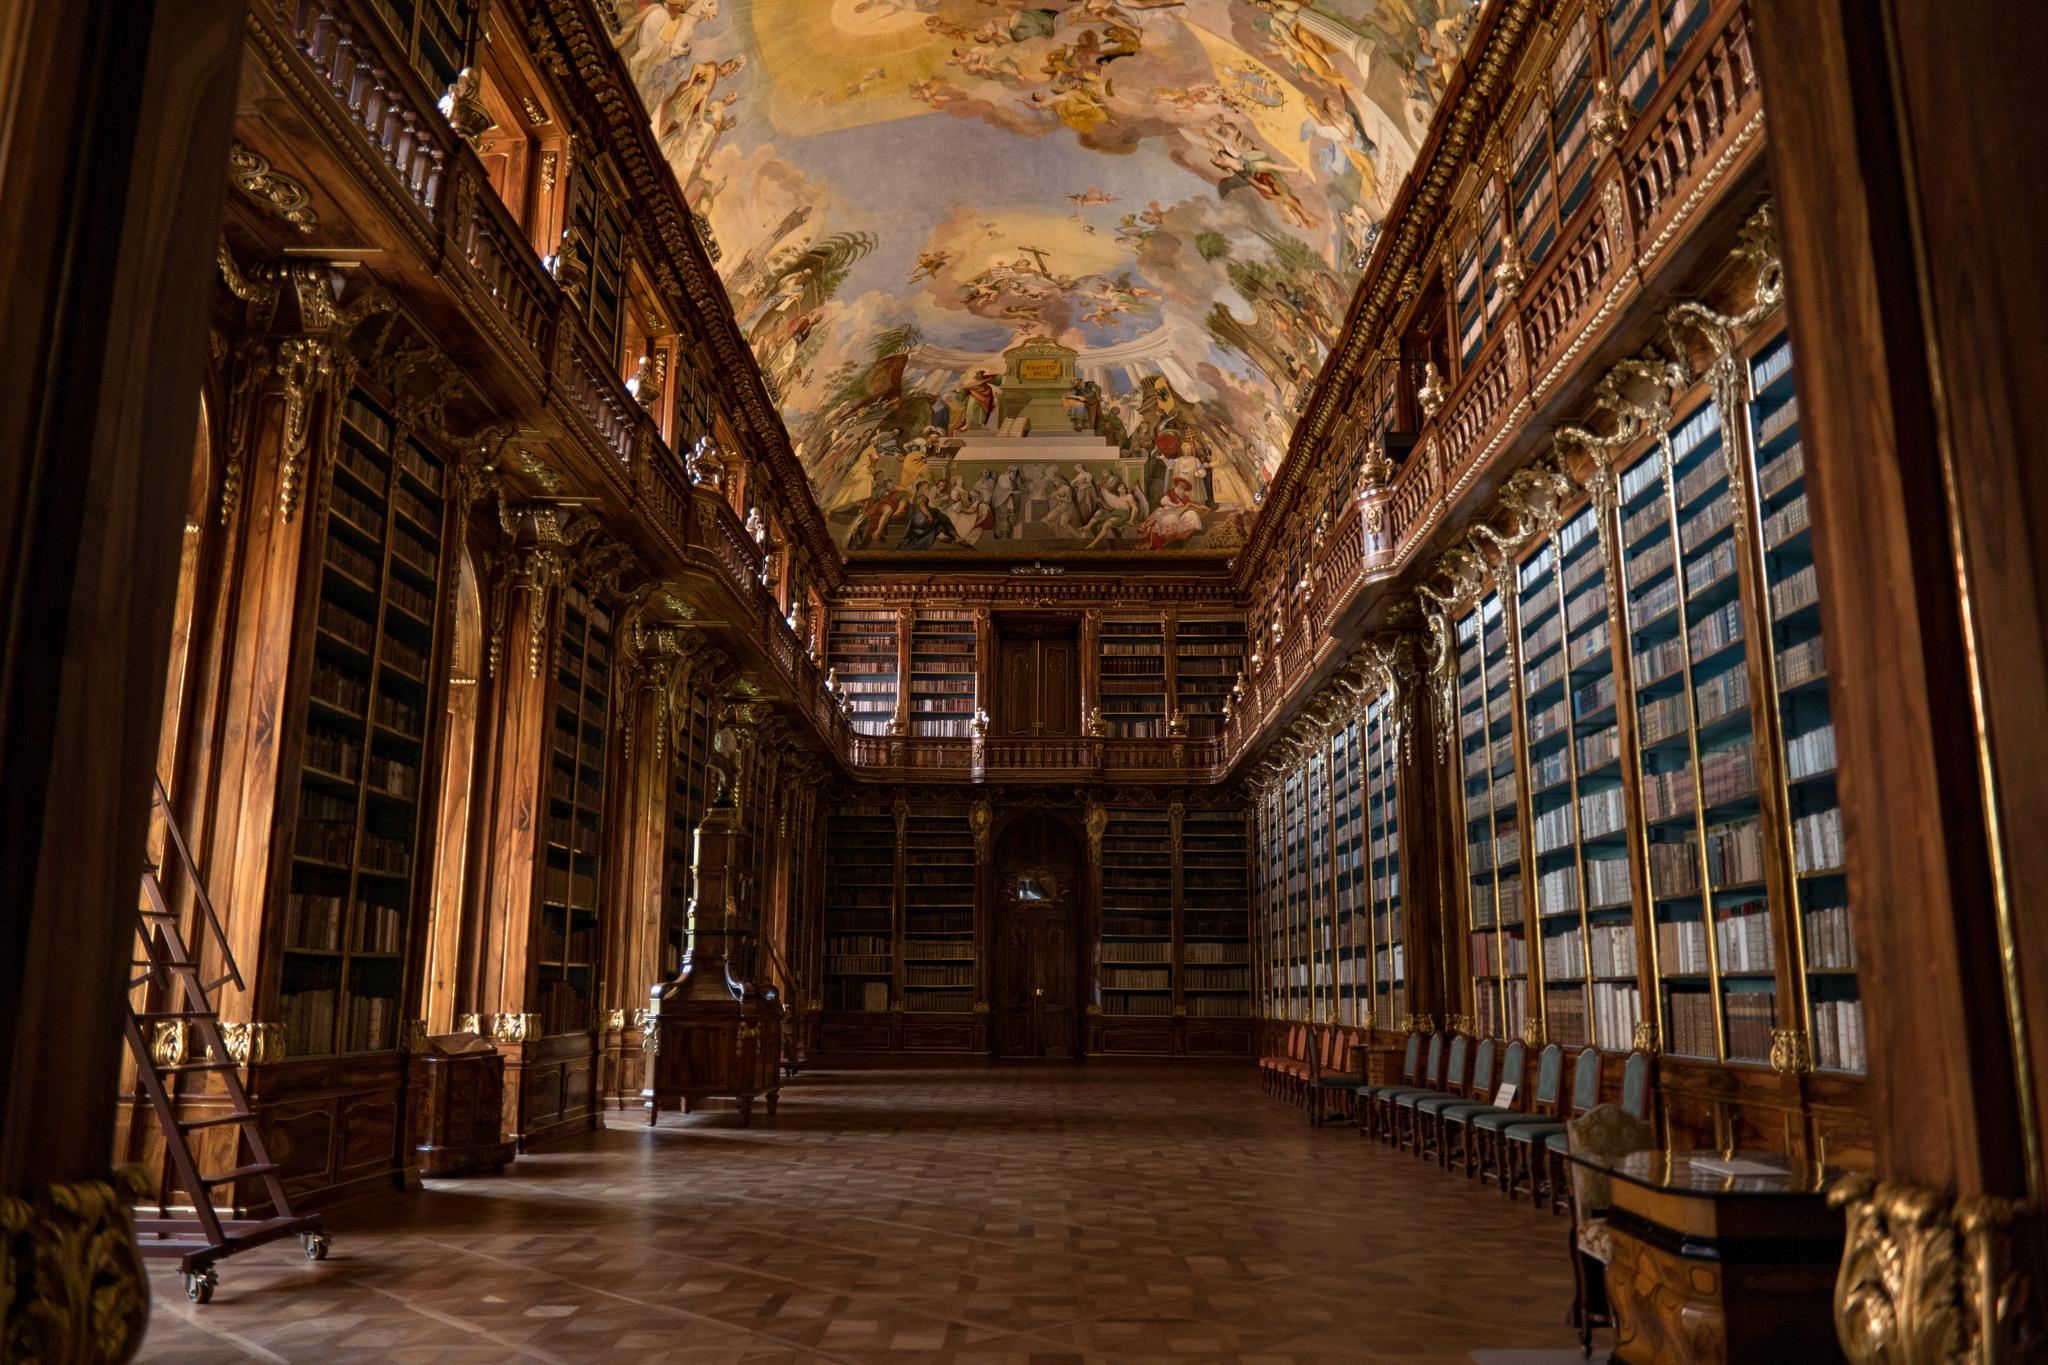 Sala Filosófica de la Biblioteca de Strahov   @nanpalmero en Flick (cc)